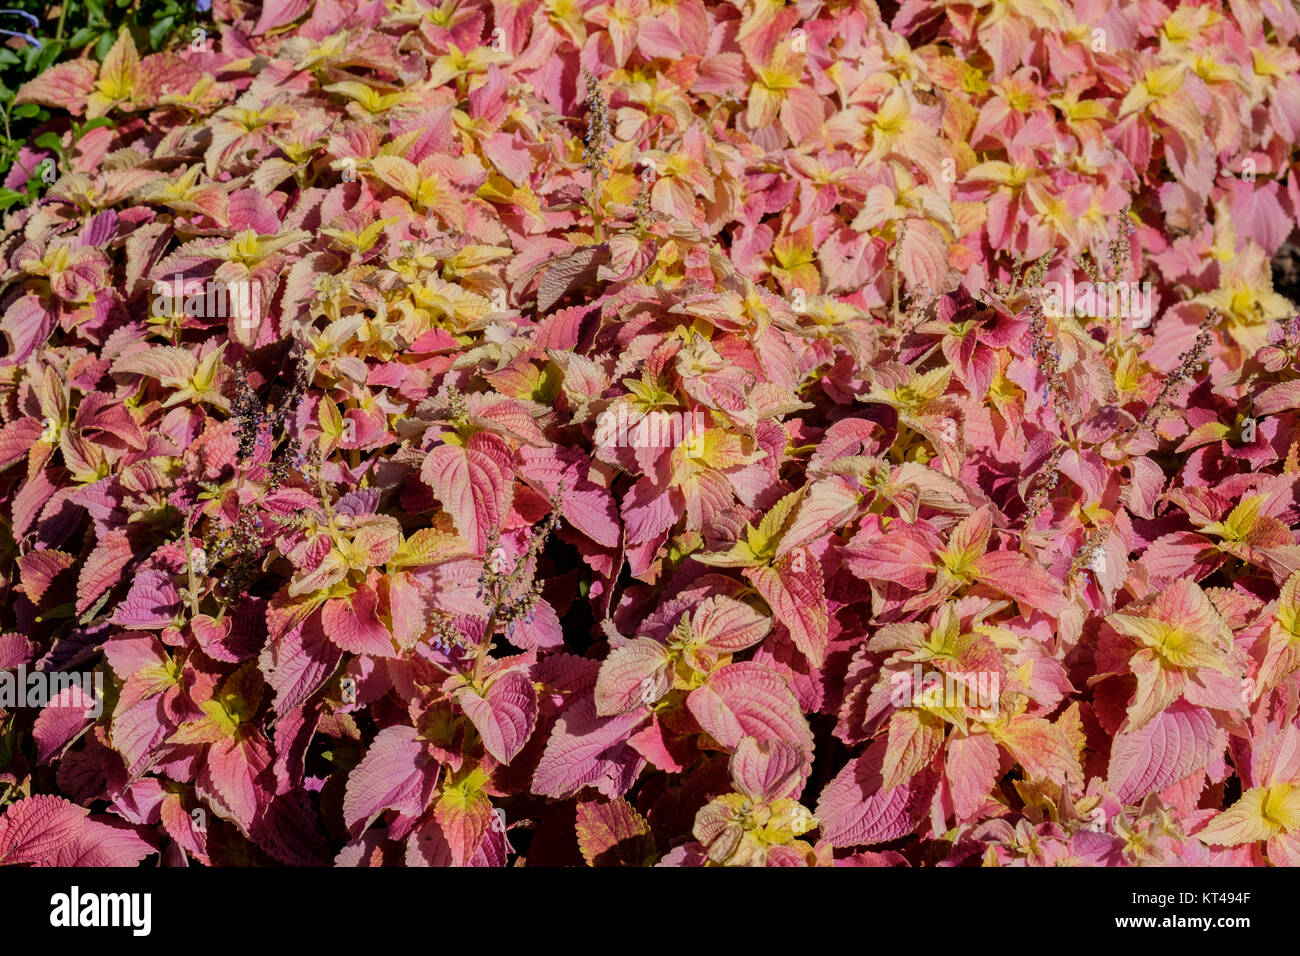 Coleus 'sedona', Solenostemon scutellarioides, growing in a botanical garden in Oklahoma City, Oklahoma, USA. Stock Photo